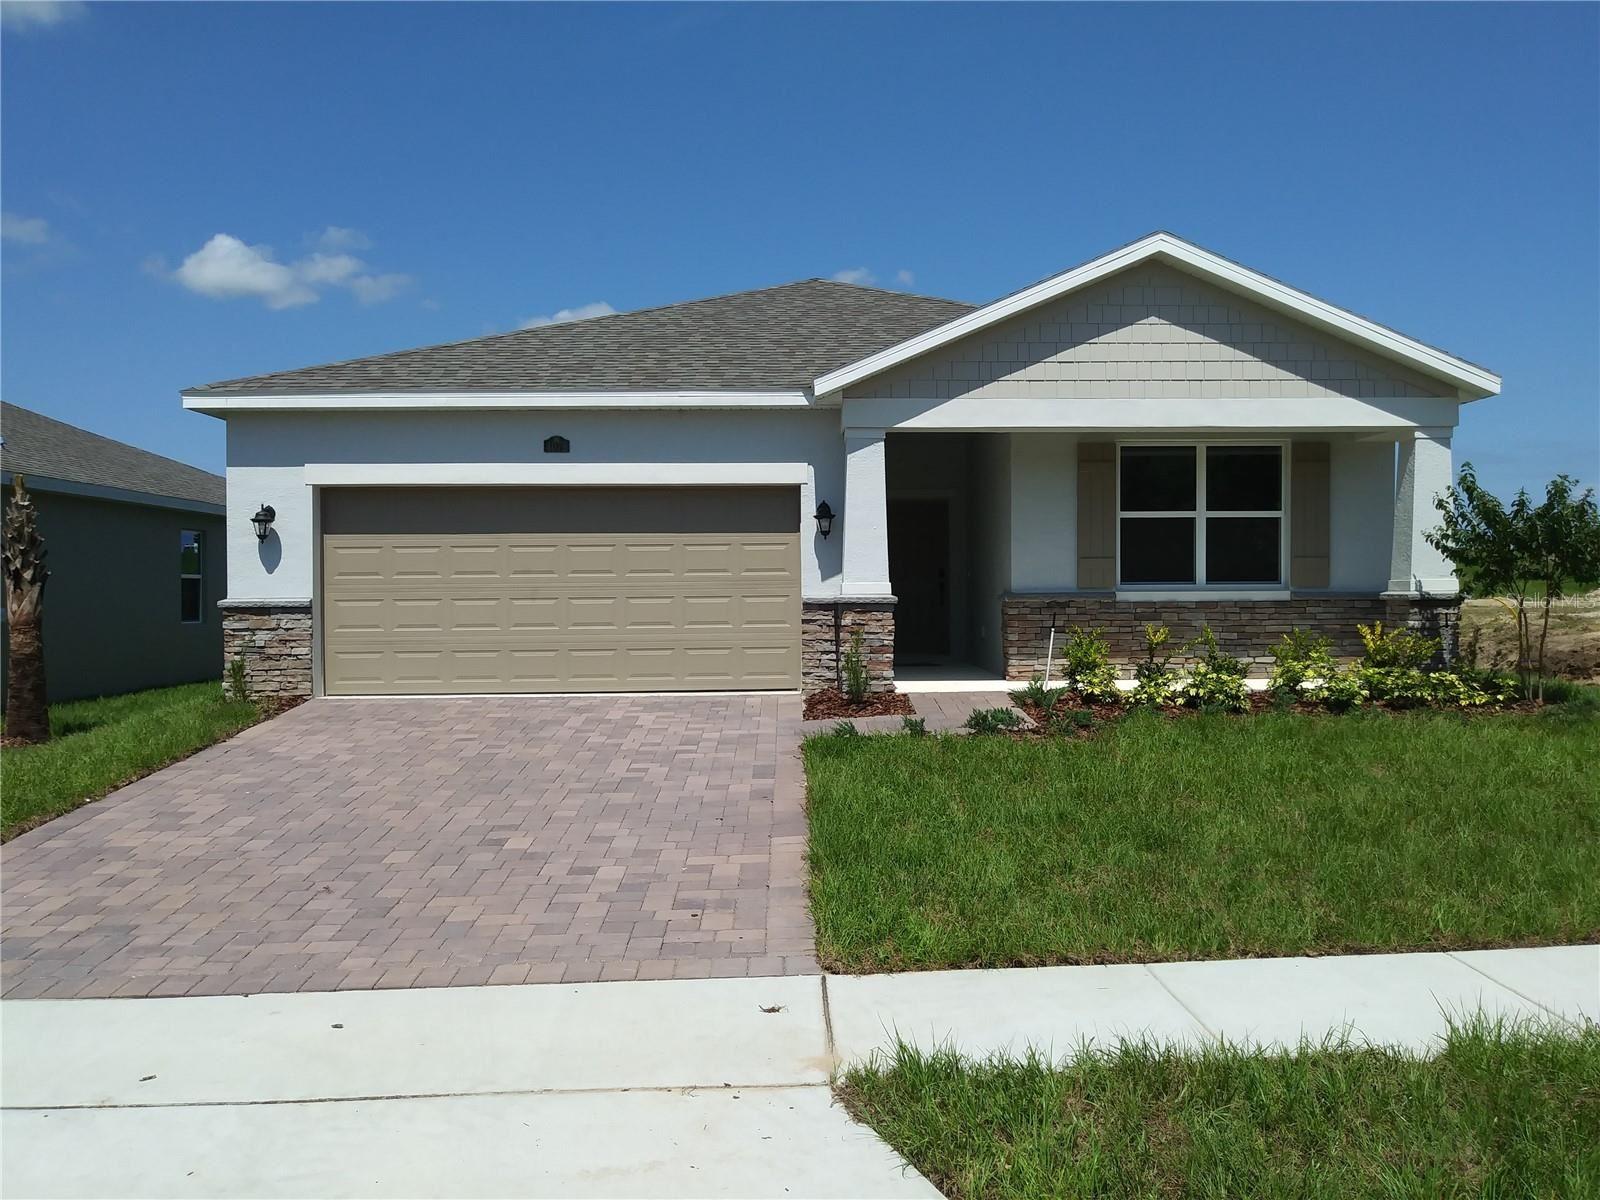 4924 AUTUMN RIDGE DRIVE, Wesley Chapel, FL 33545 - MLS#: O5961500